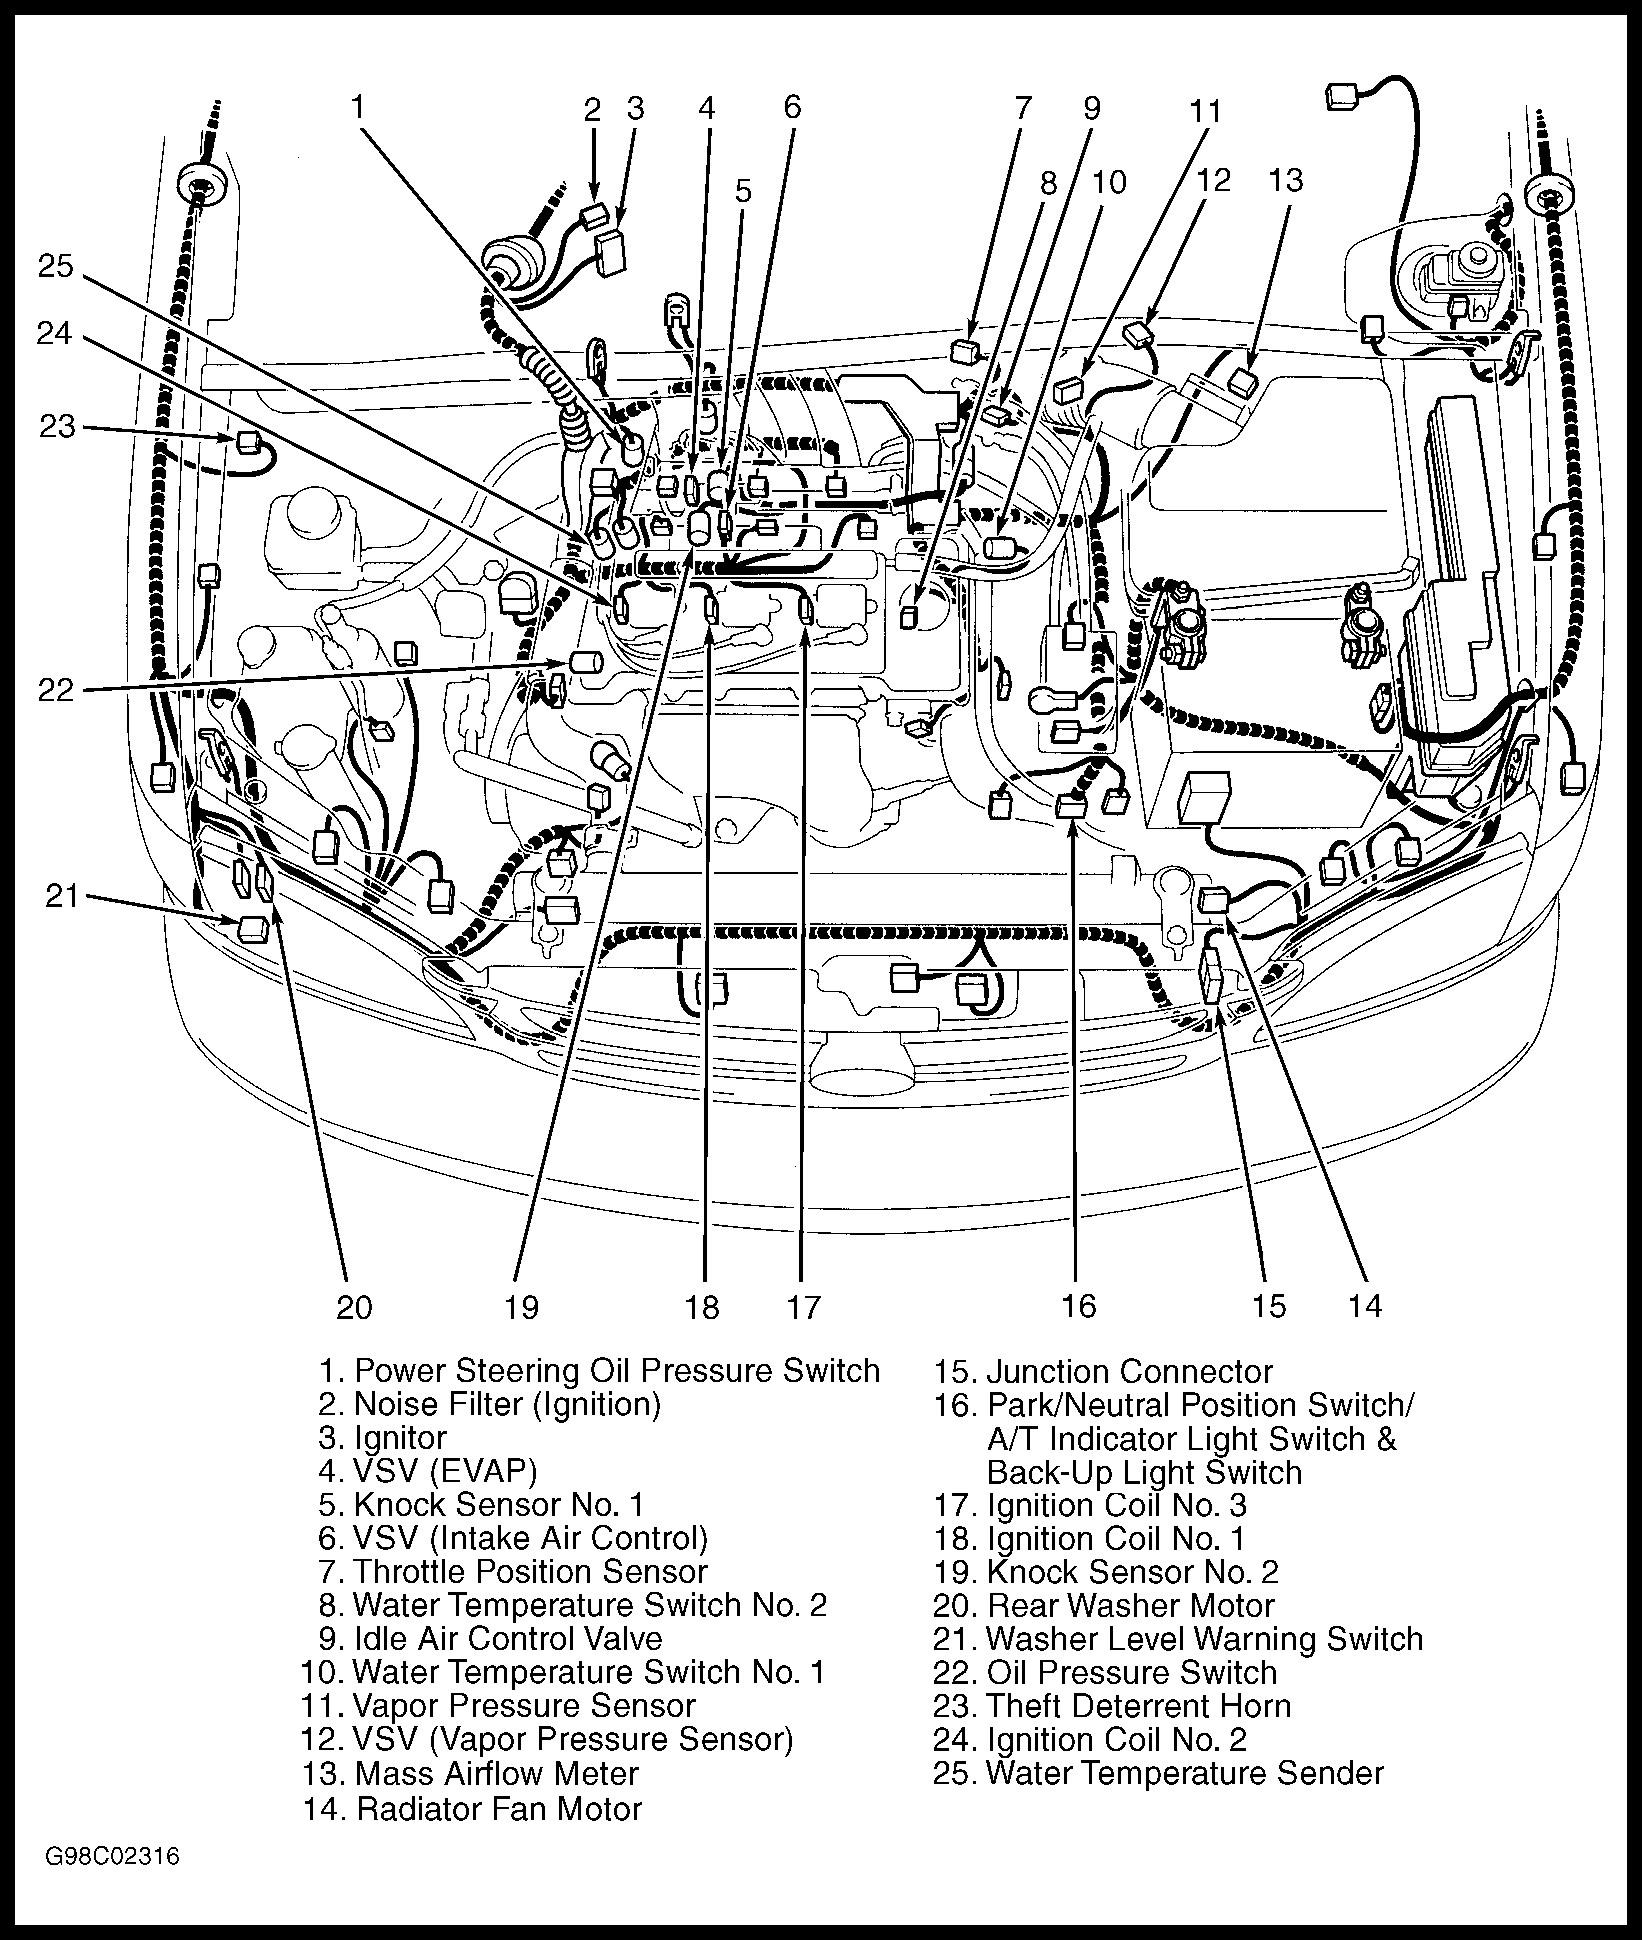 toyota v4 engine diagram smart wiring diagrams u2022 rh krakencraft co 2006 toyota rav4 engine diagram